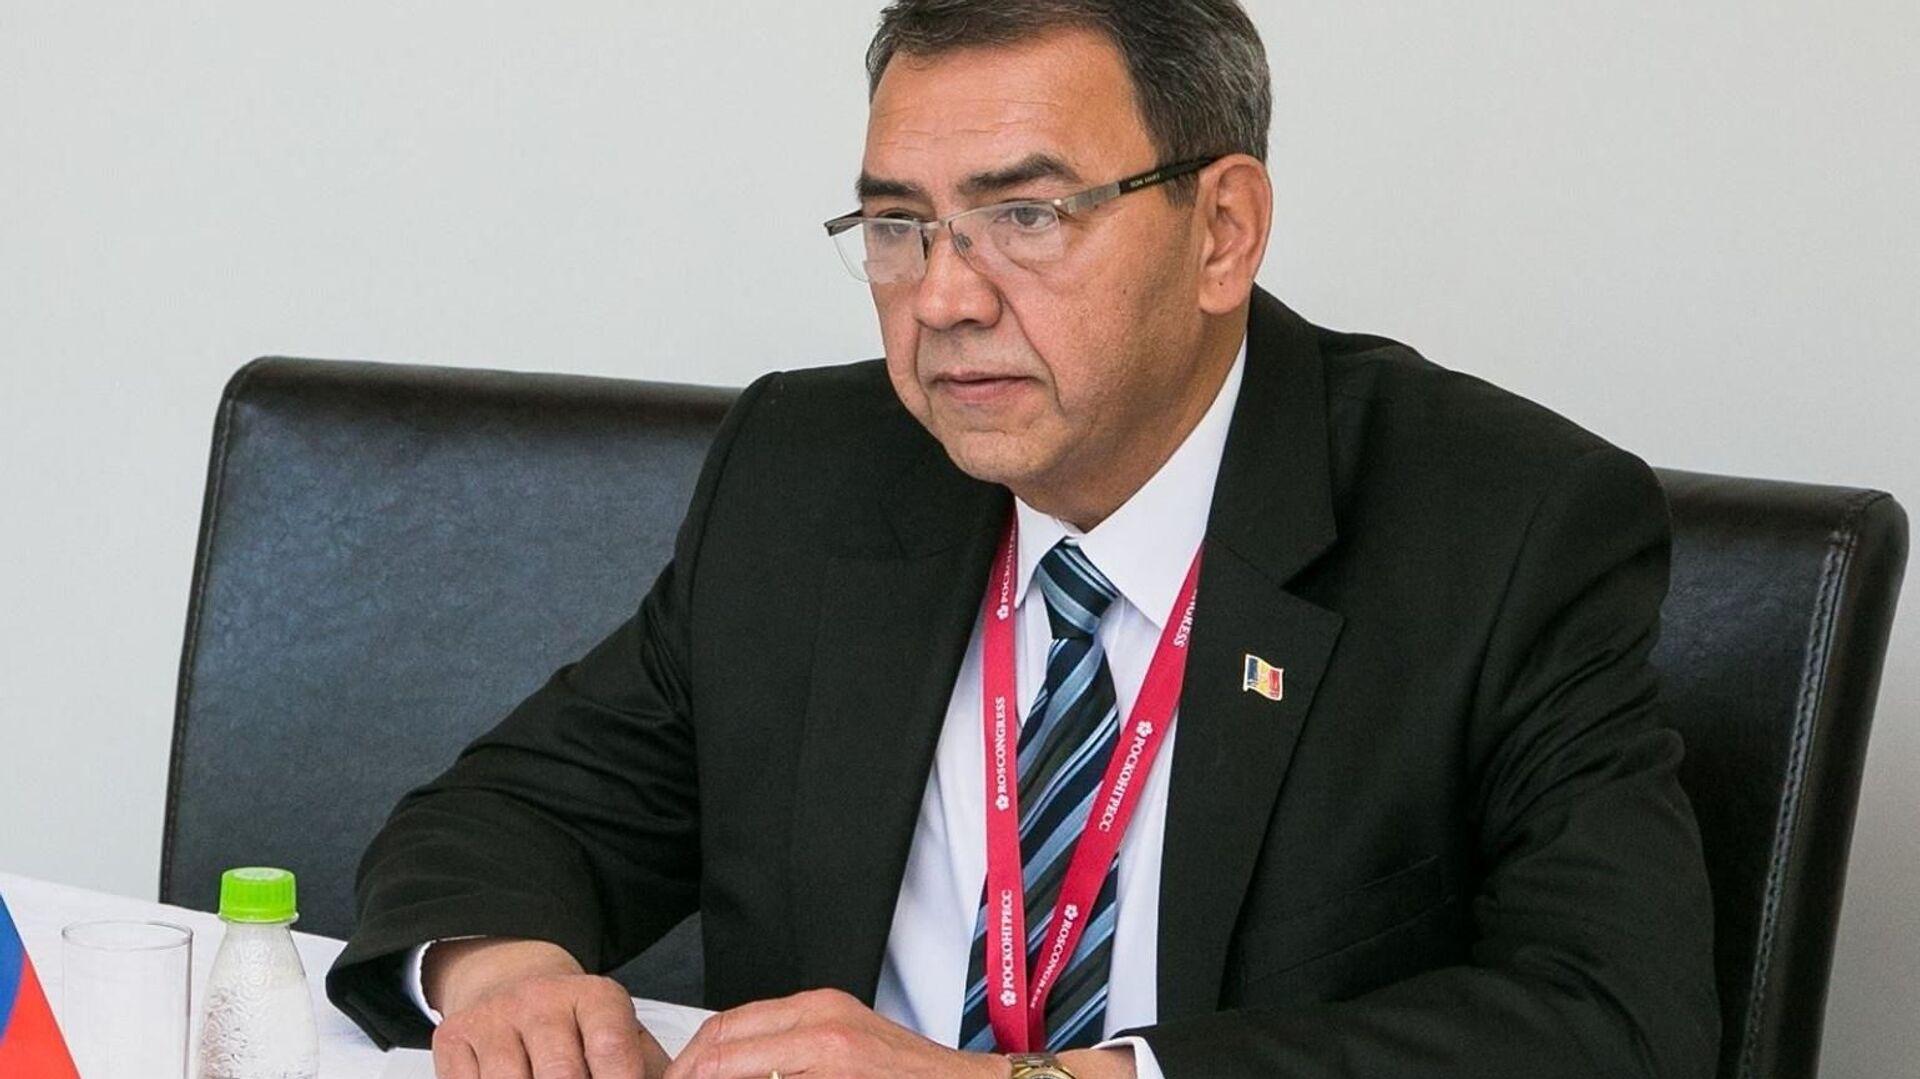 L'ambasciatore della Moldavia in Russia Vladimir Golovatyuk - Sputnik Italia, 1920, 29.07.2021